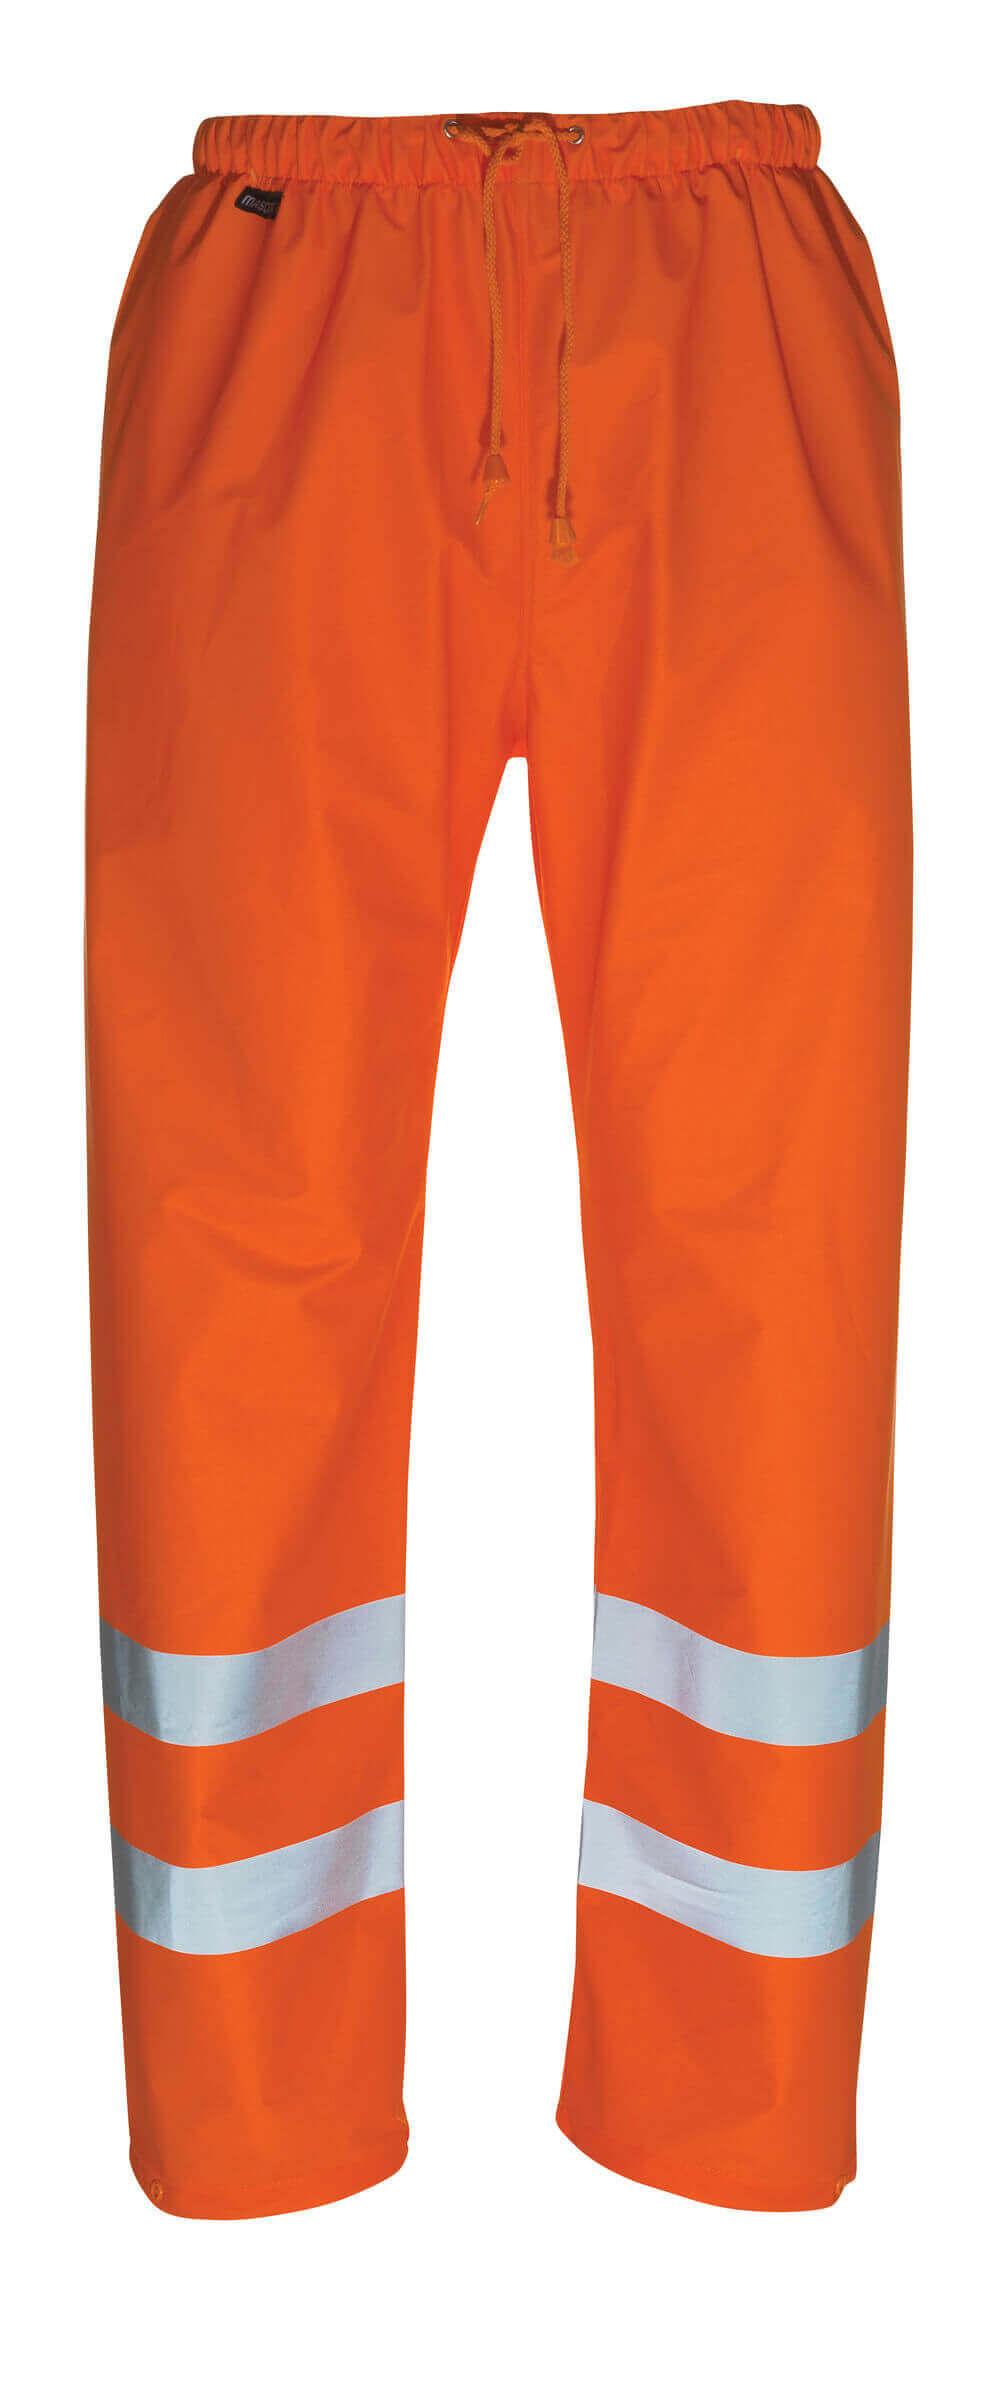 50102-814-14 Rain pants - hi-vis orange